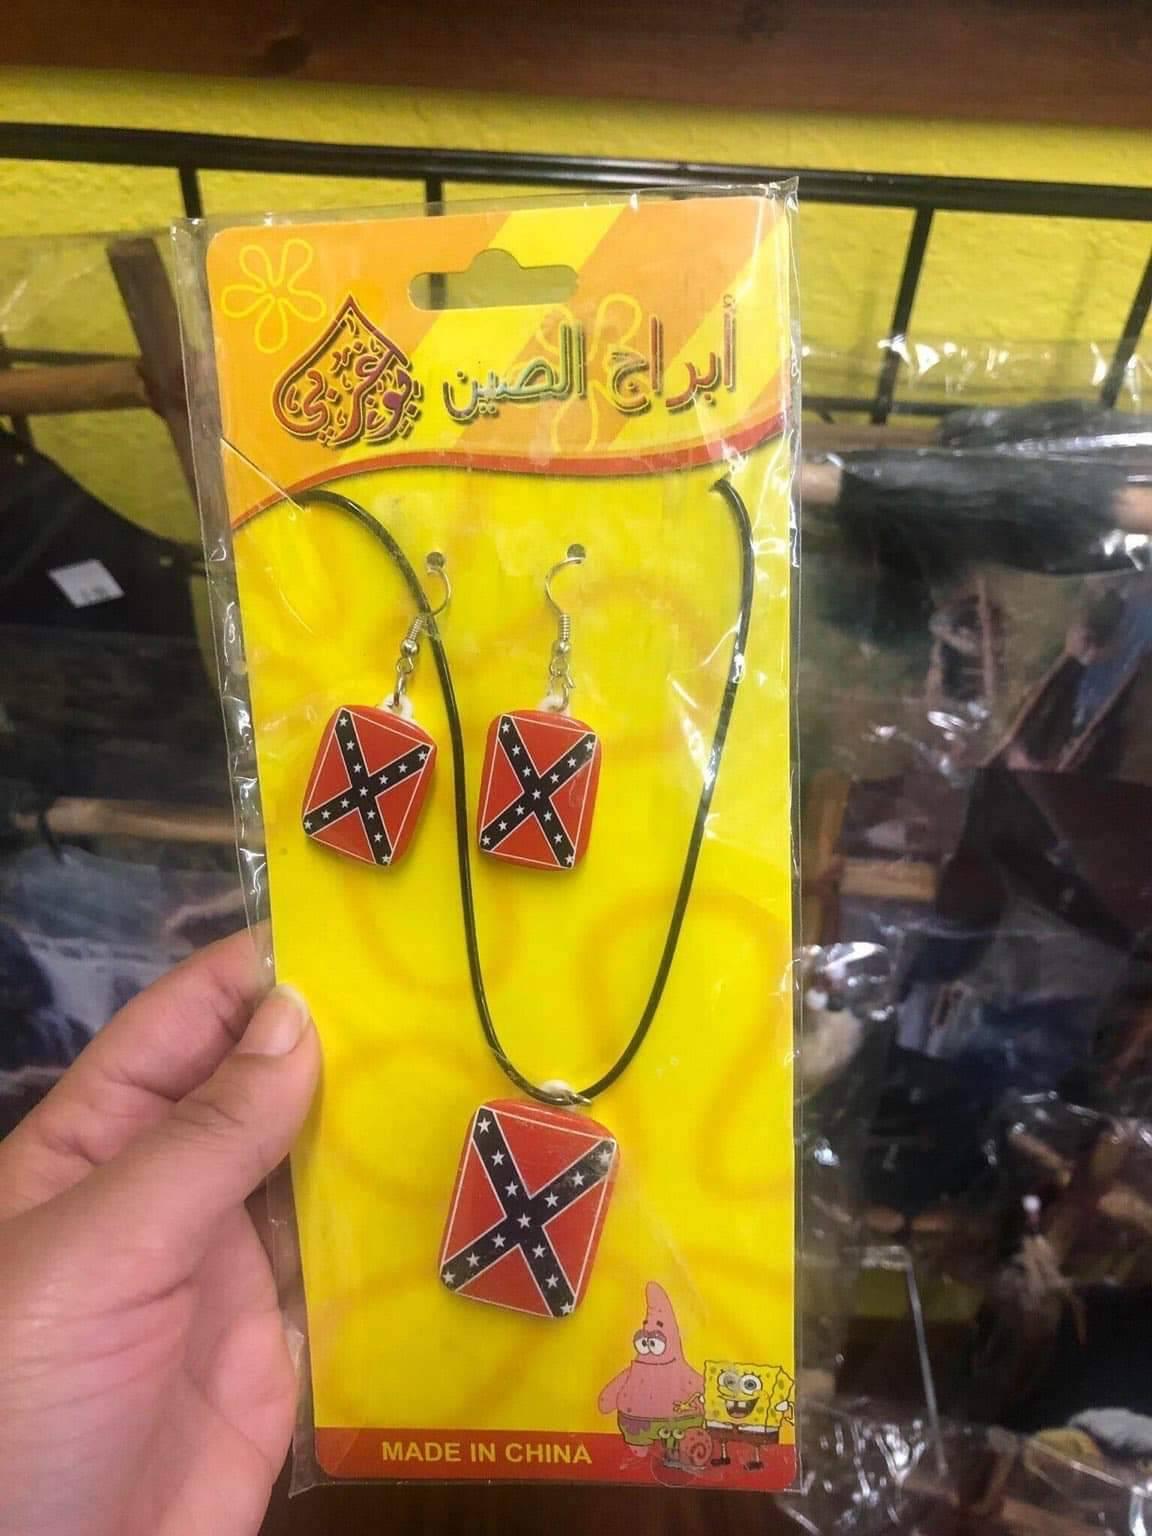 Multicultural.